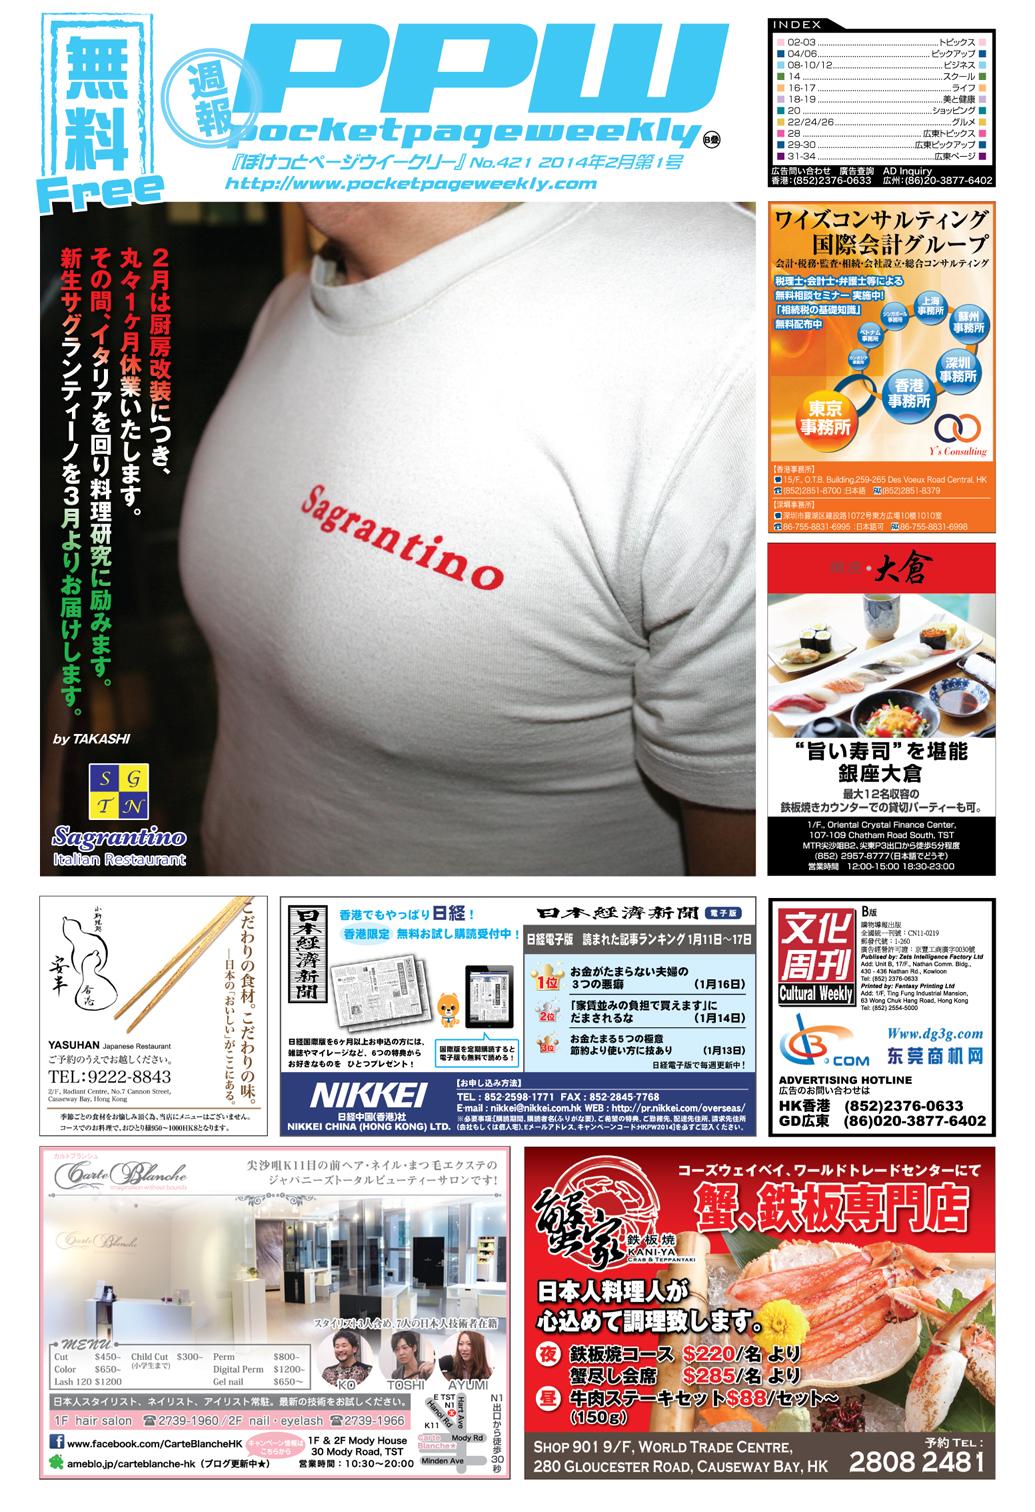 P01 Frontpage_421